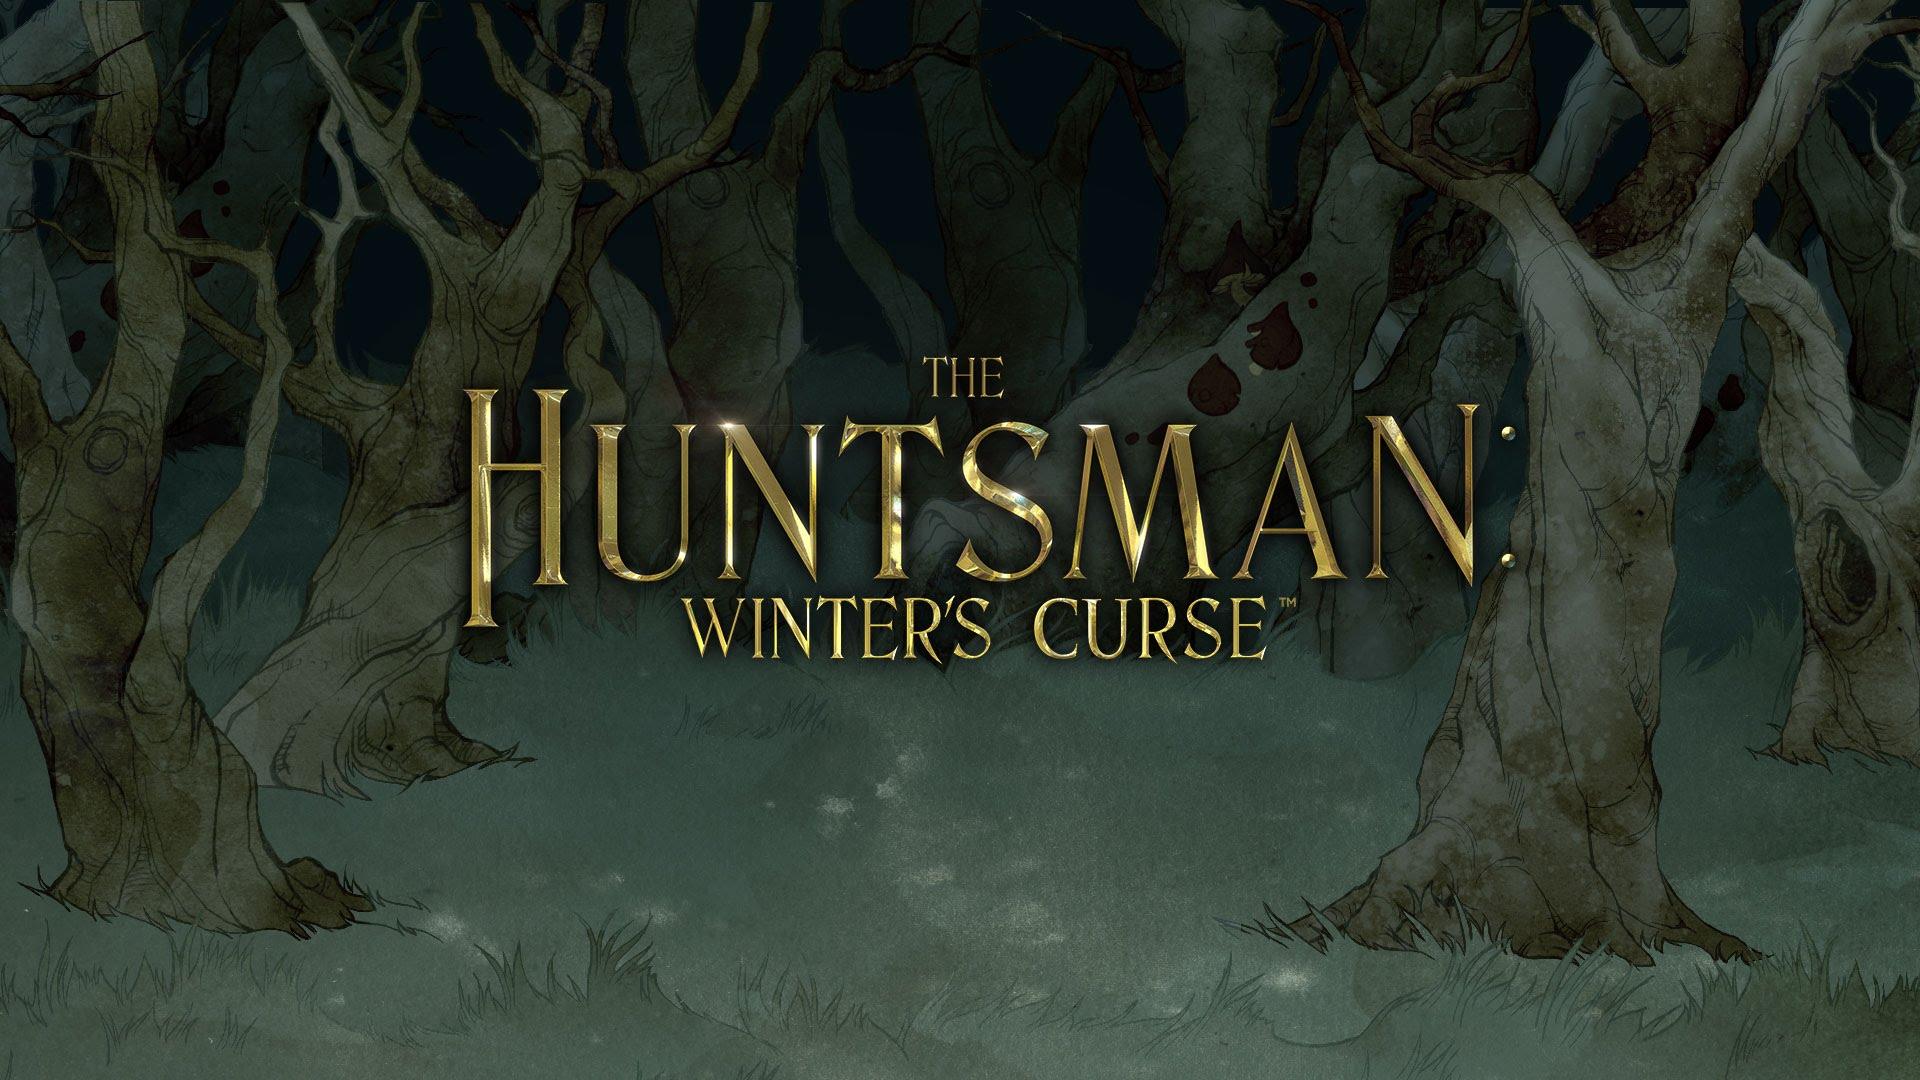 The Huntsman WintersCurse